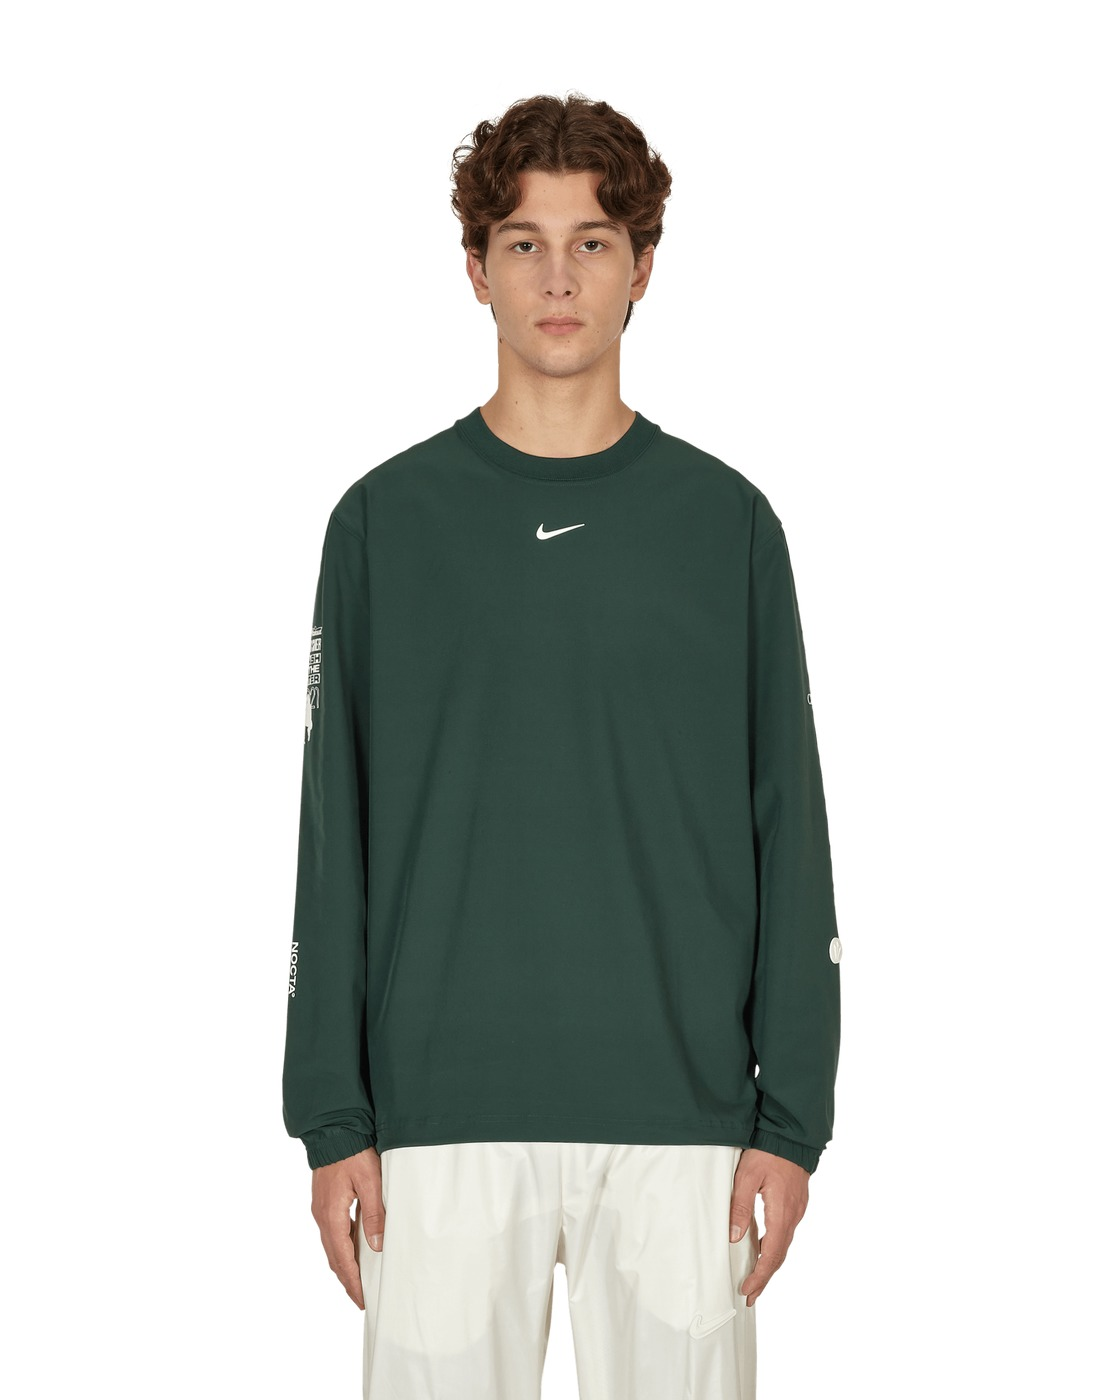 Photo: Nike Special Project Nocta Woven Crewneck Sweatshirt Pro Green/Black